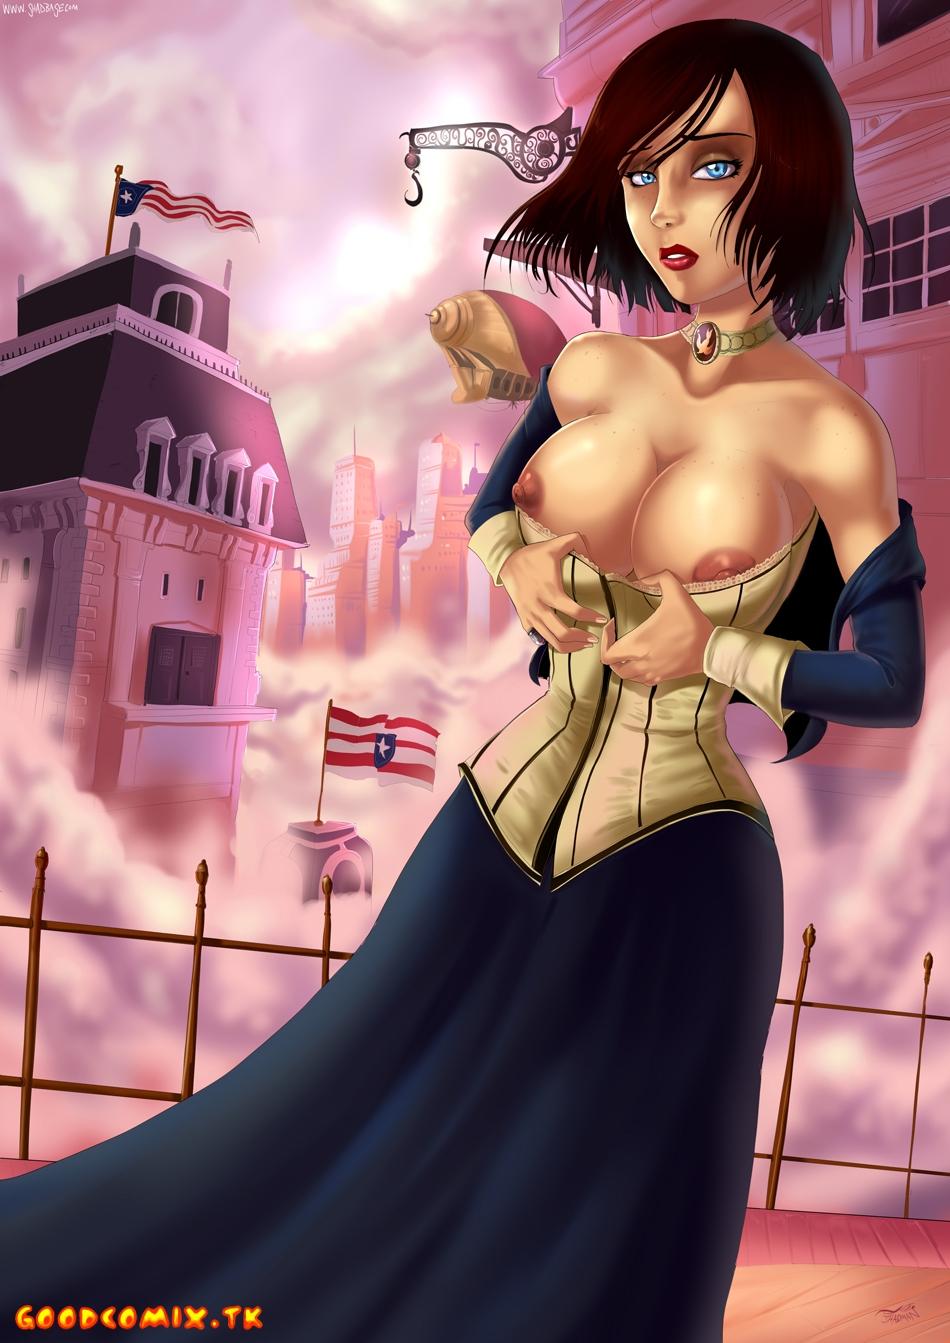 Goodcomix Bioshock - [Shadbase] - Infititt